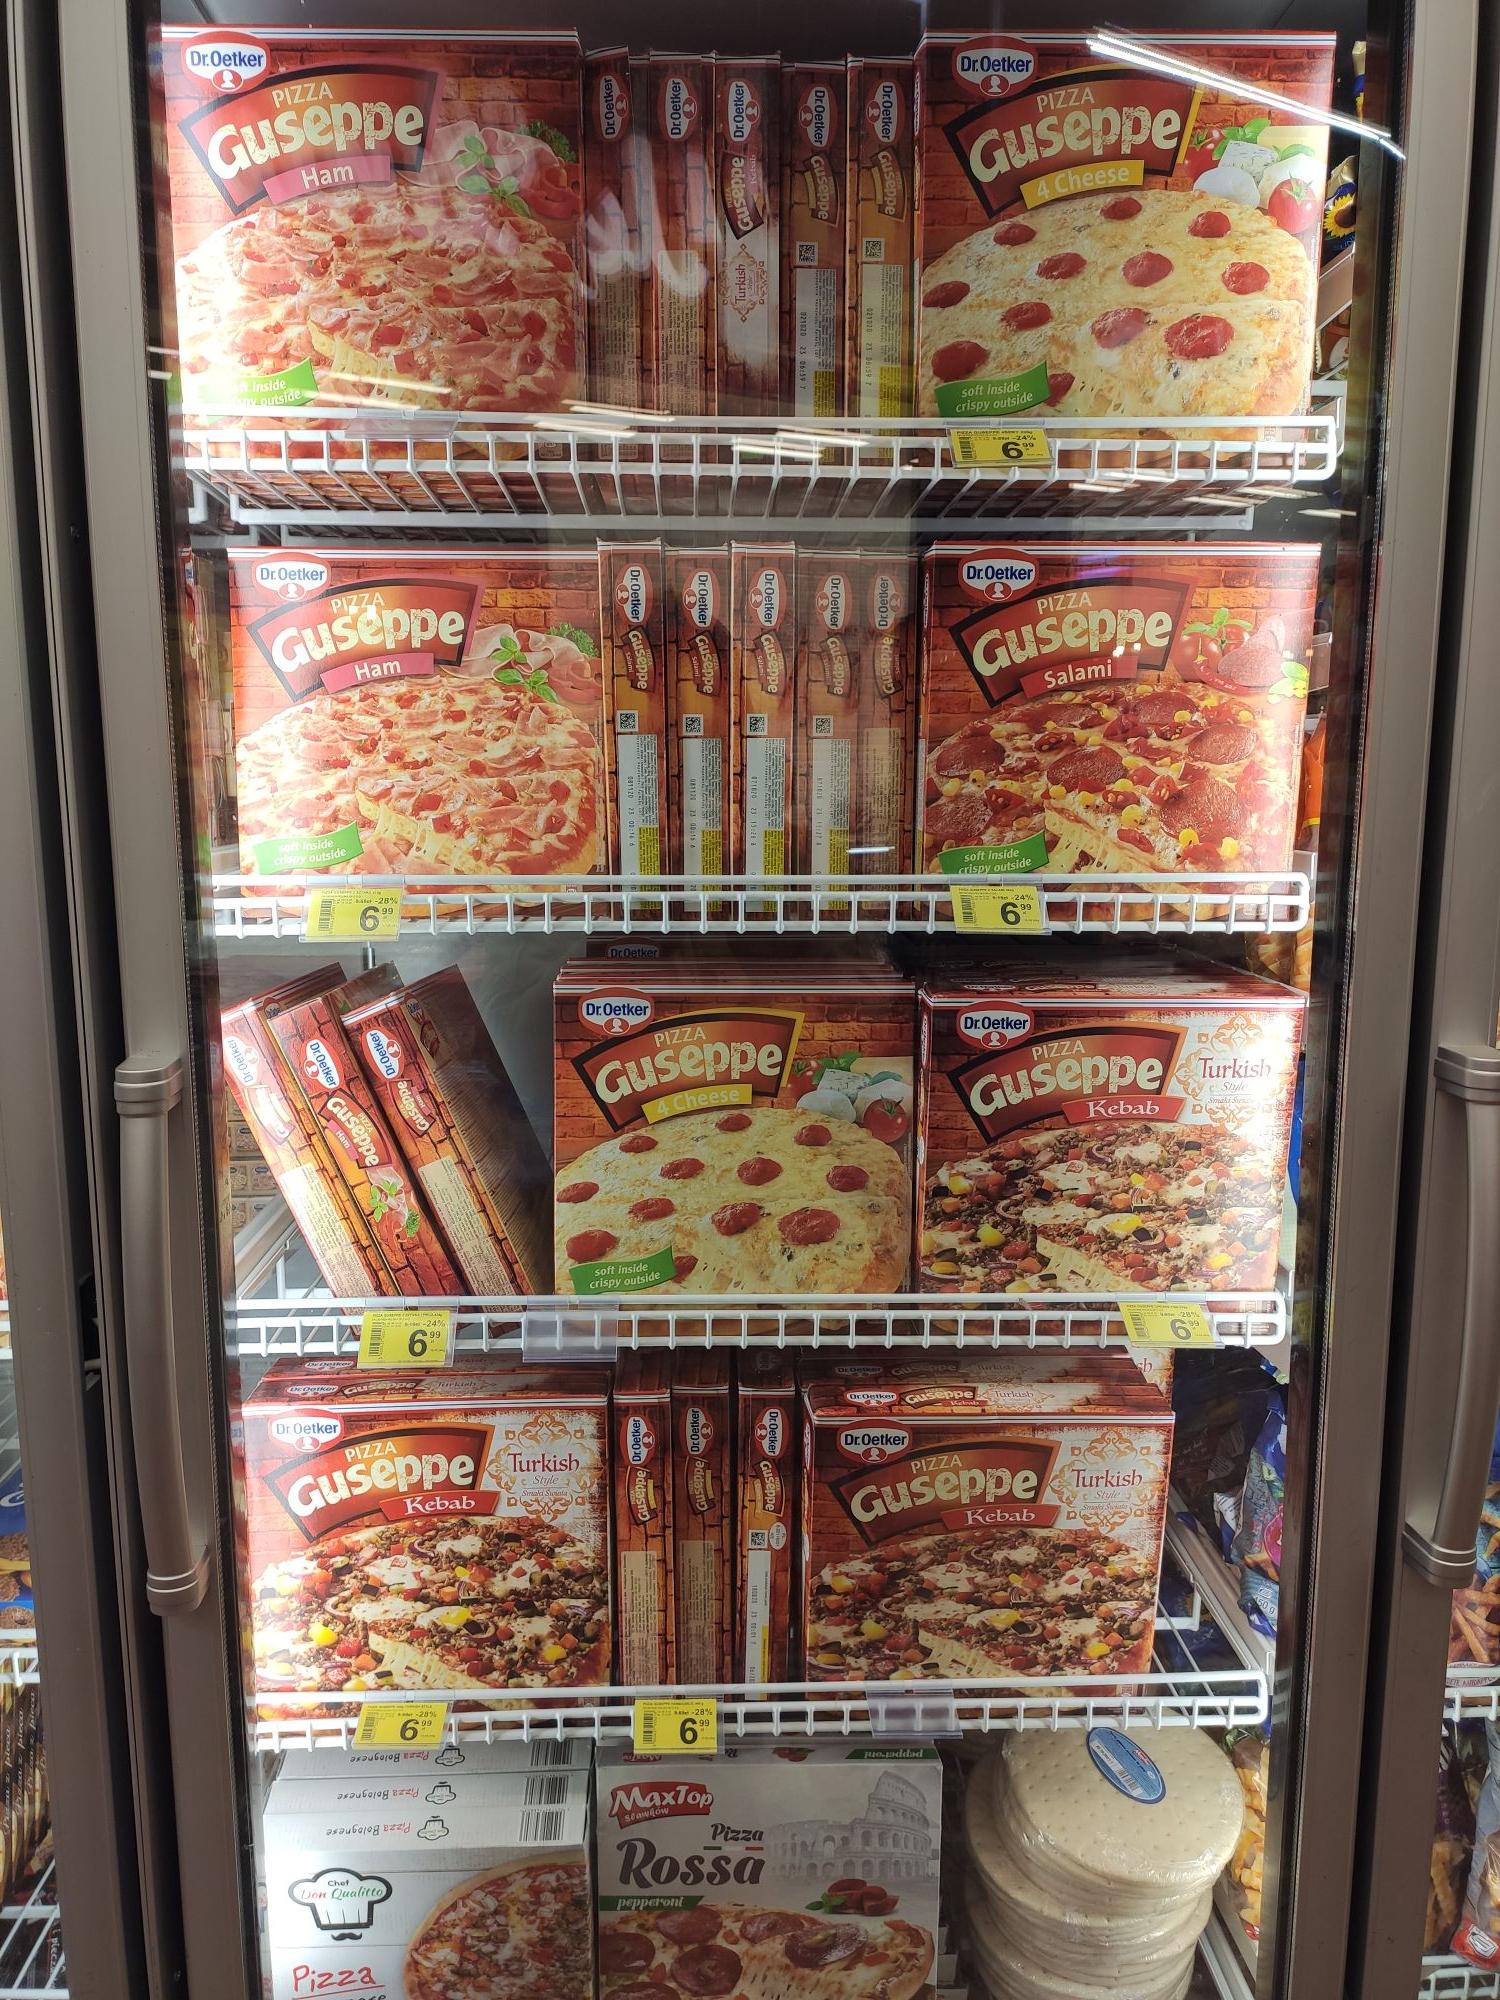 Pizza Guseppe 6.99 zł różne smaki Carrefour